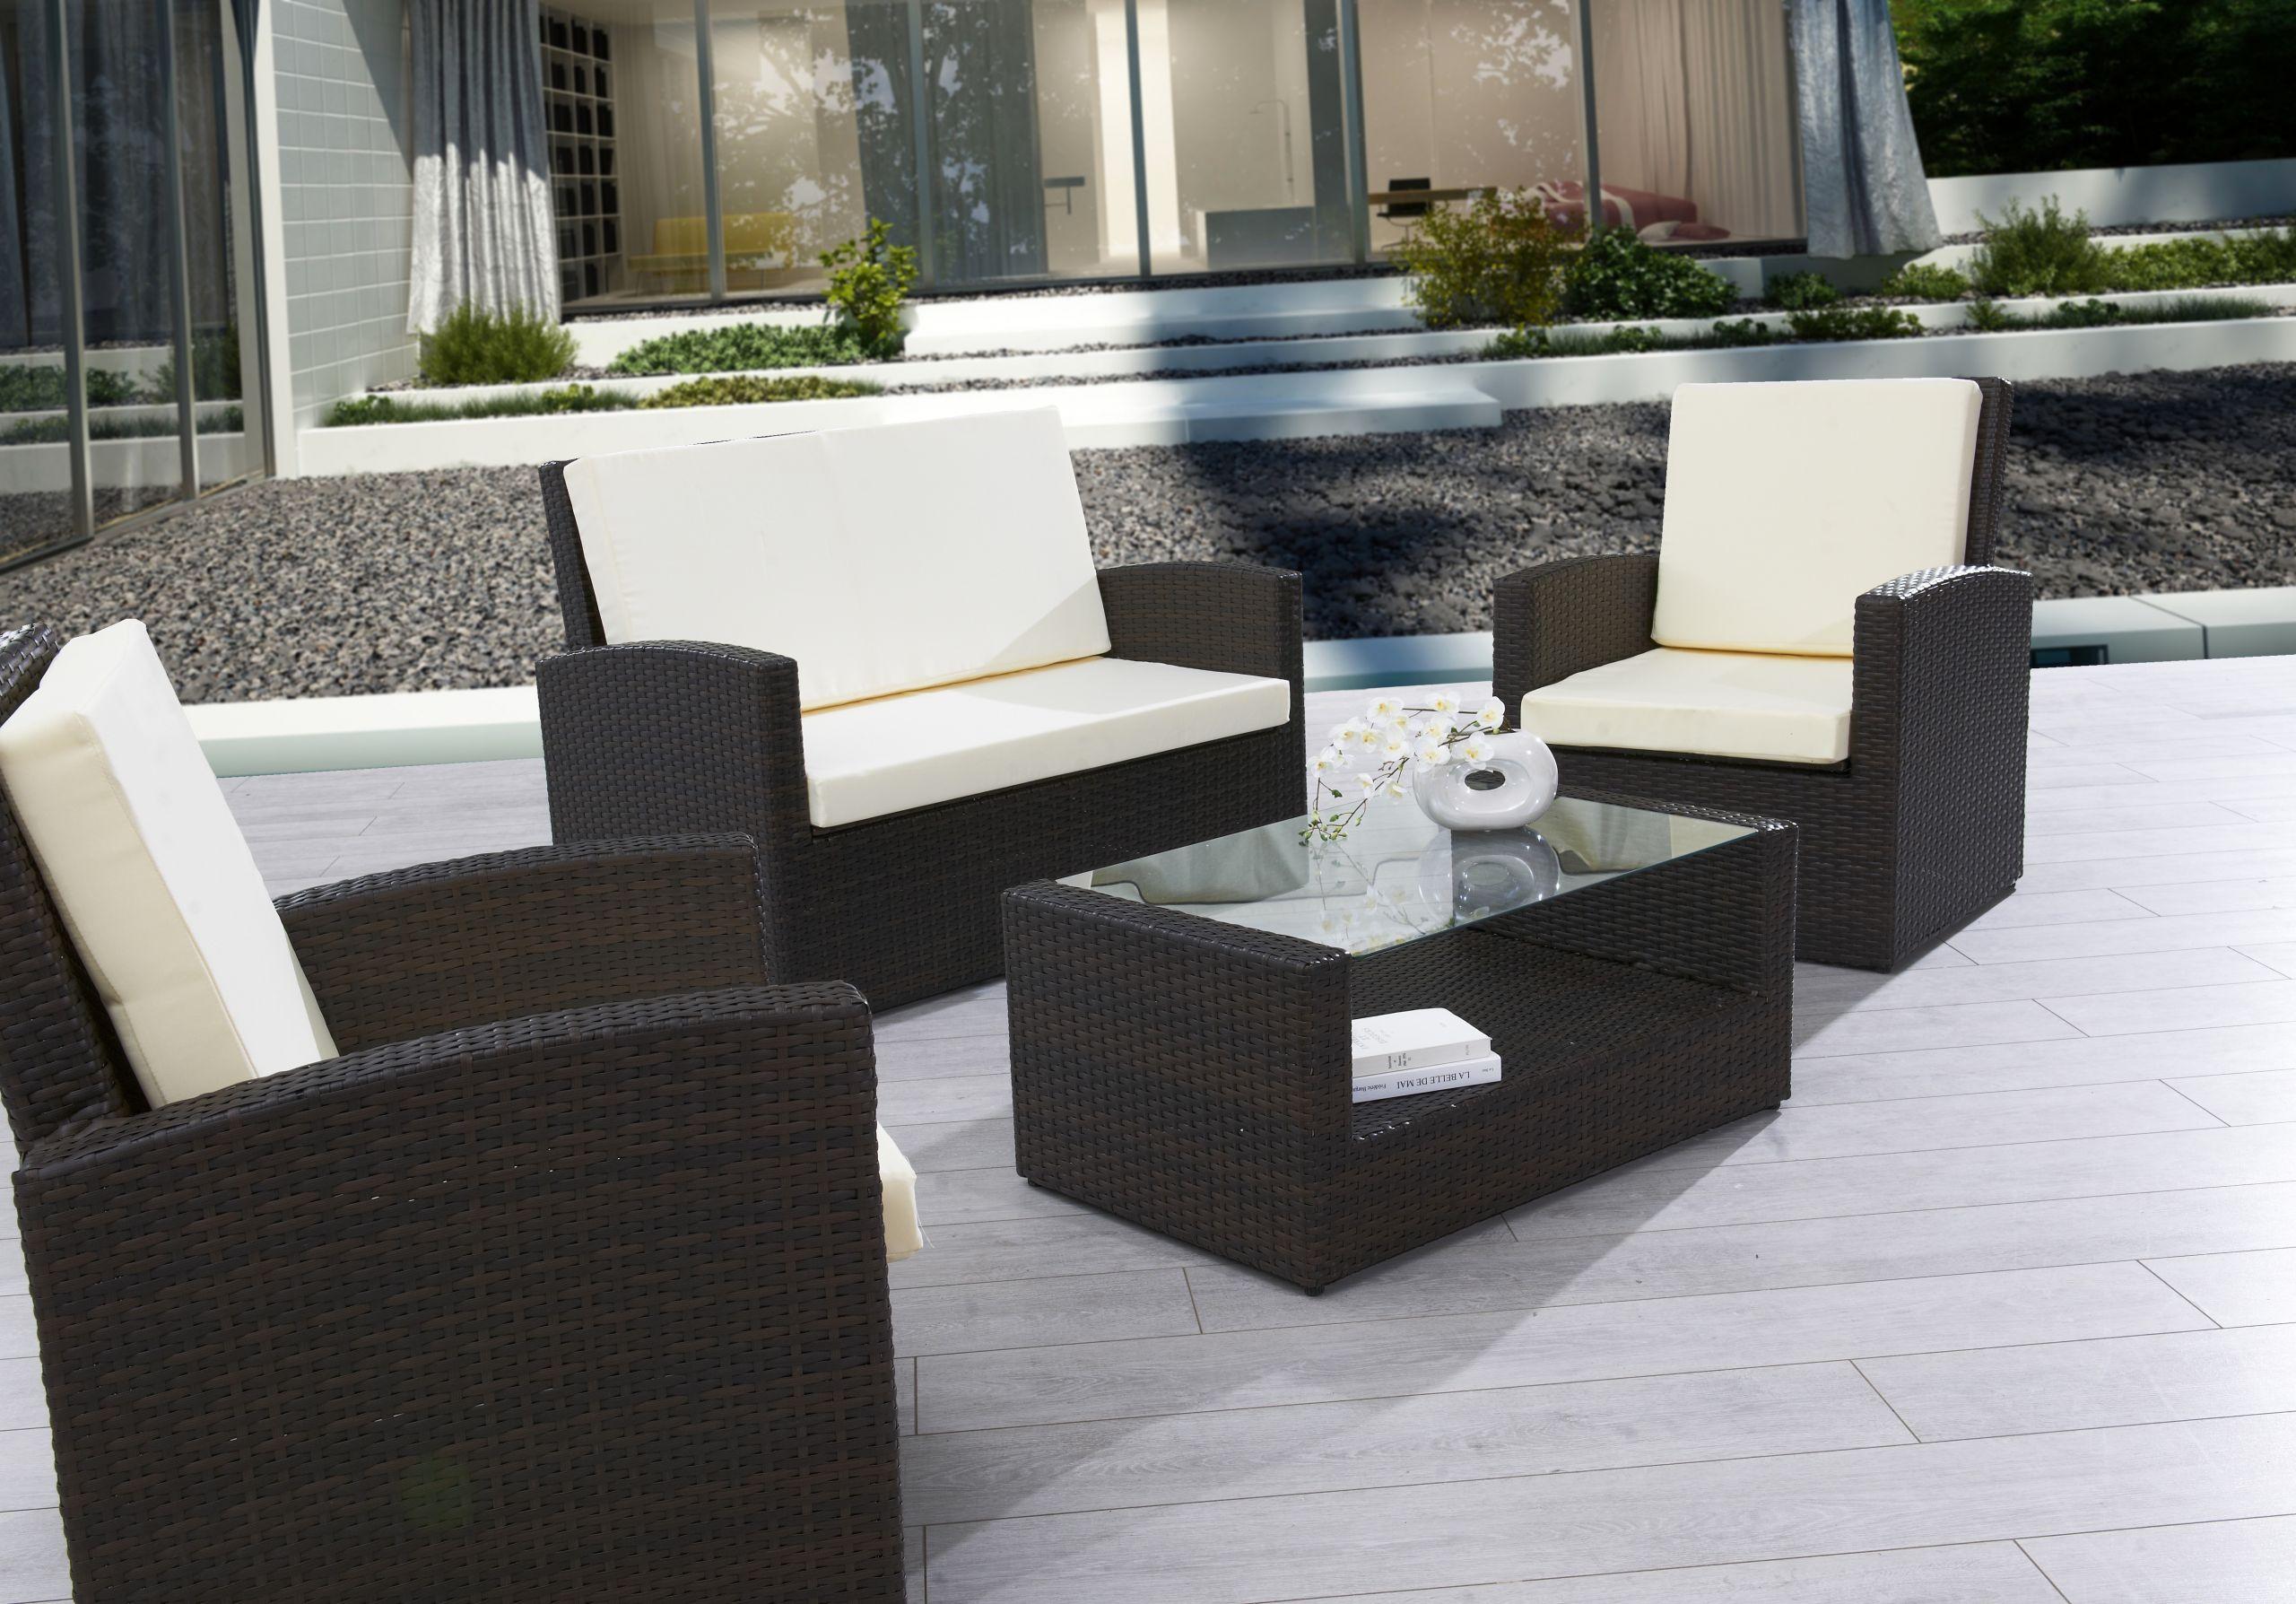 Table Jardin Resine Best Of Salon Exterieur Terrasse | Salon ... serapportantà Table De Jardin Resine